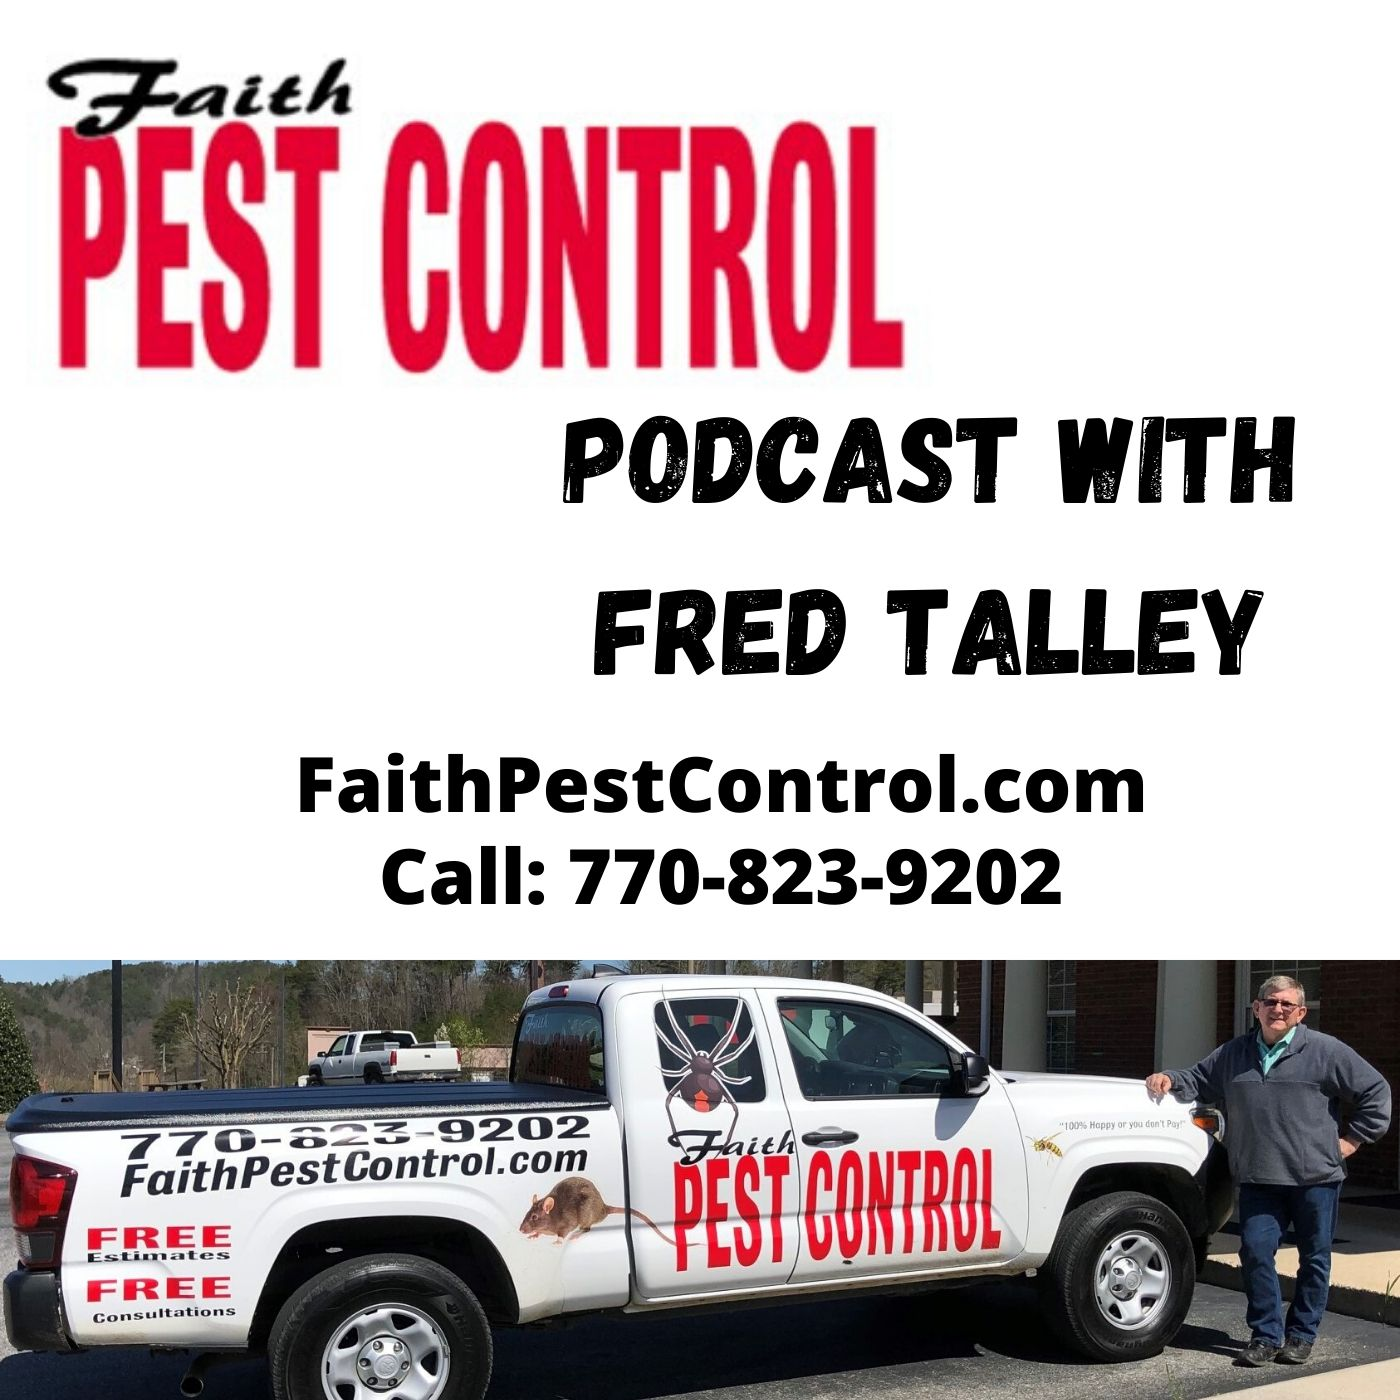 Faith Pest Control North Georgia Podcast